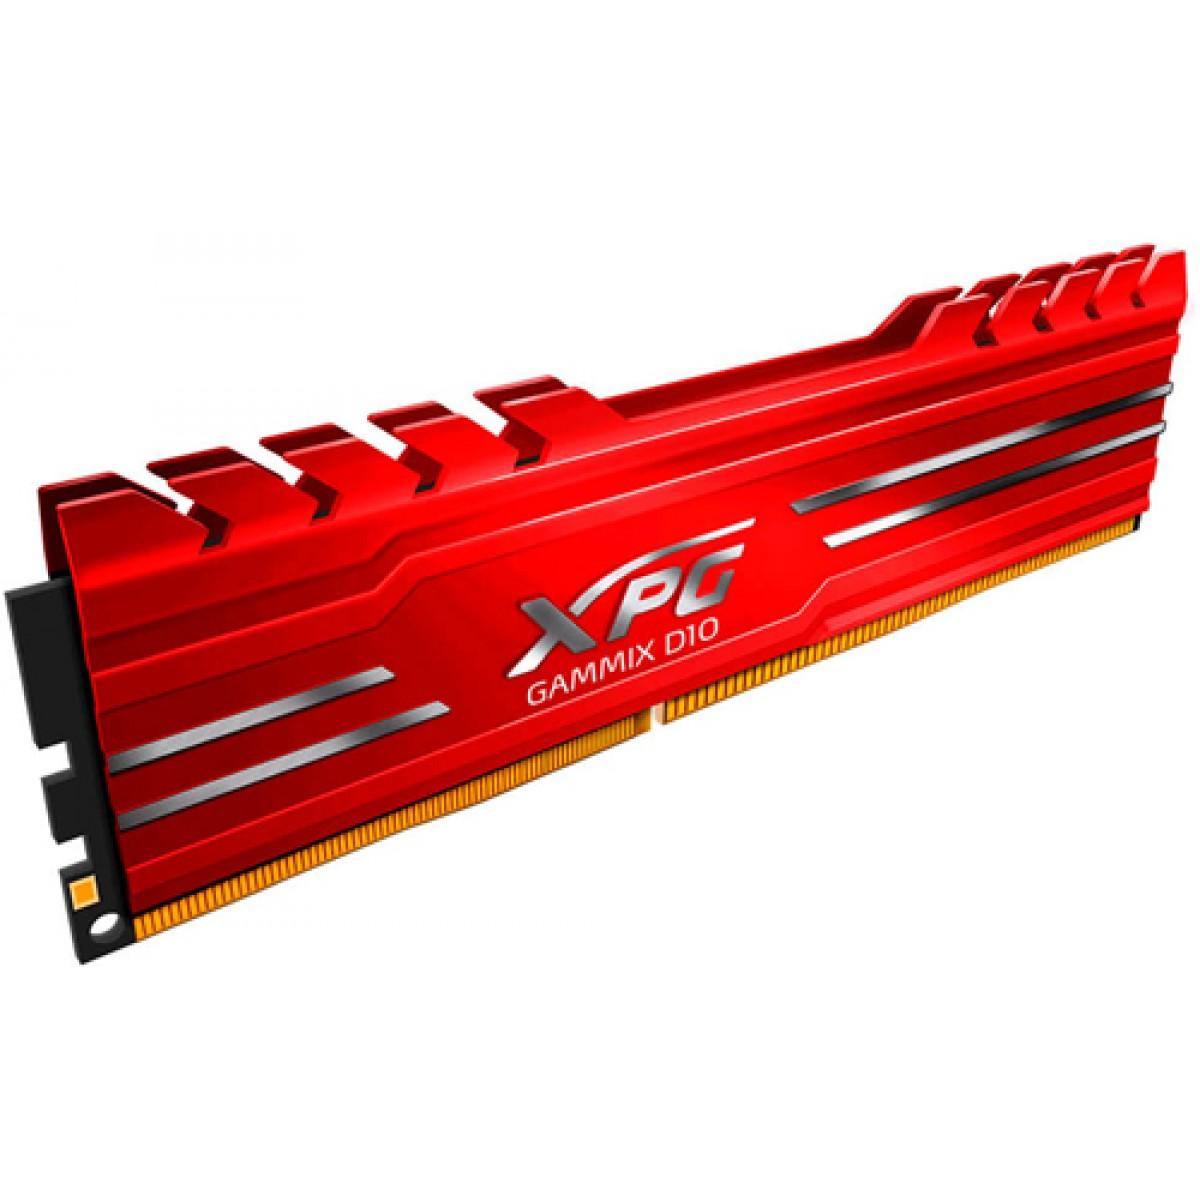 Memória DDR4 XPG Gammix D10, 16GB 3000Mhz, CL16, Red, AX4U3000716G16A-SR10